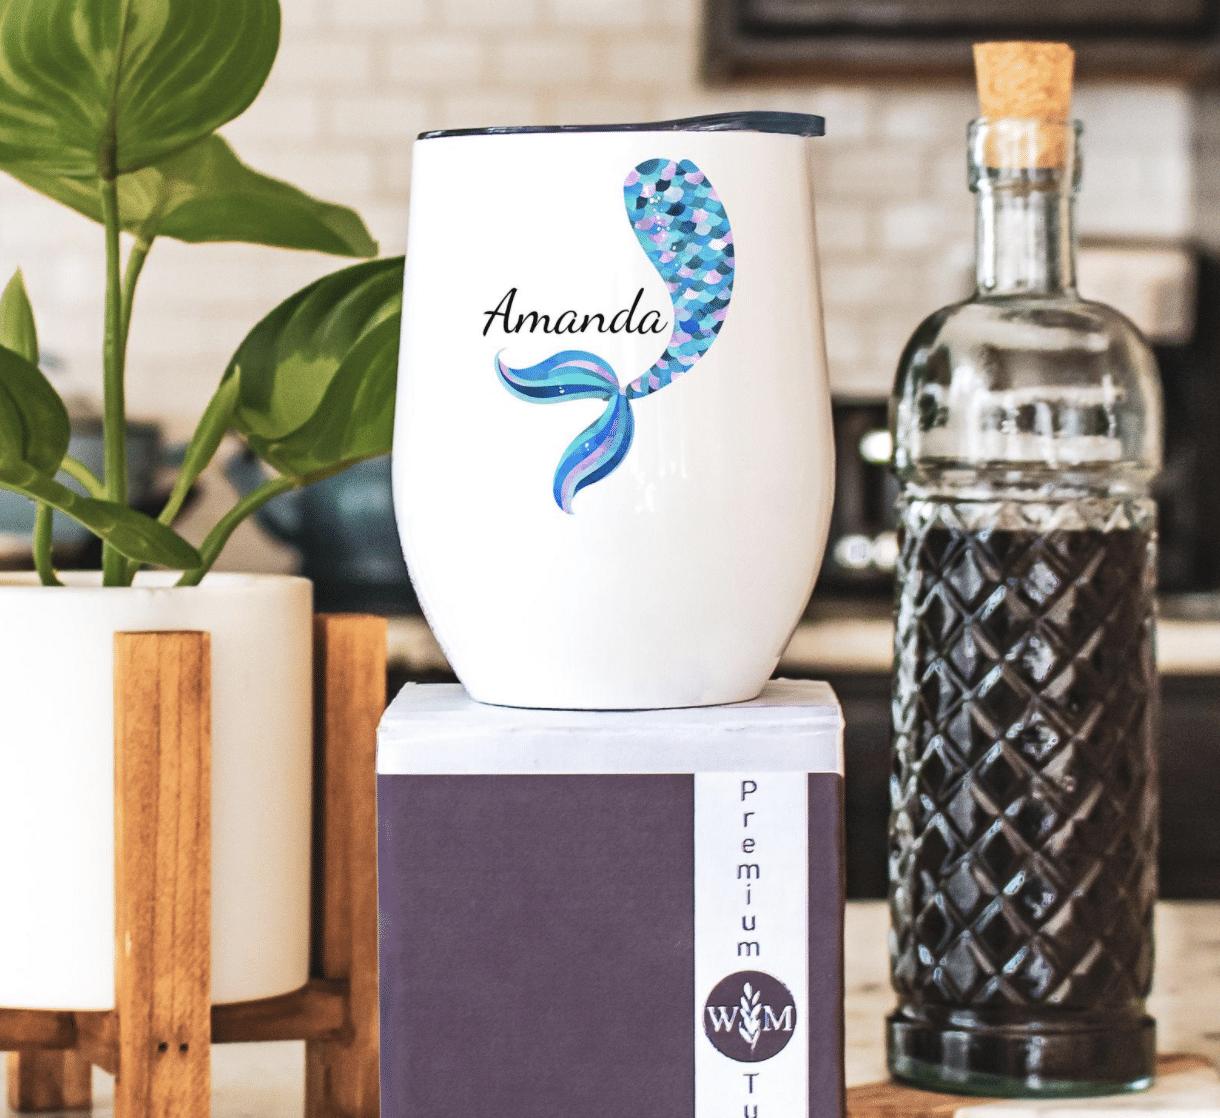 mermaid-gifts-wine-tumbler